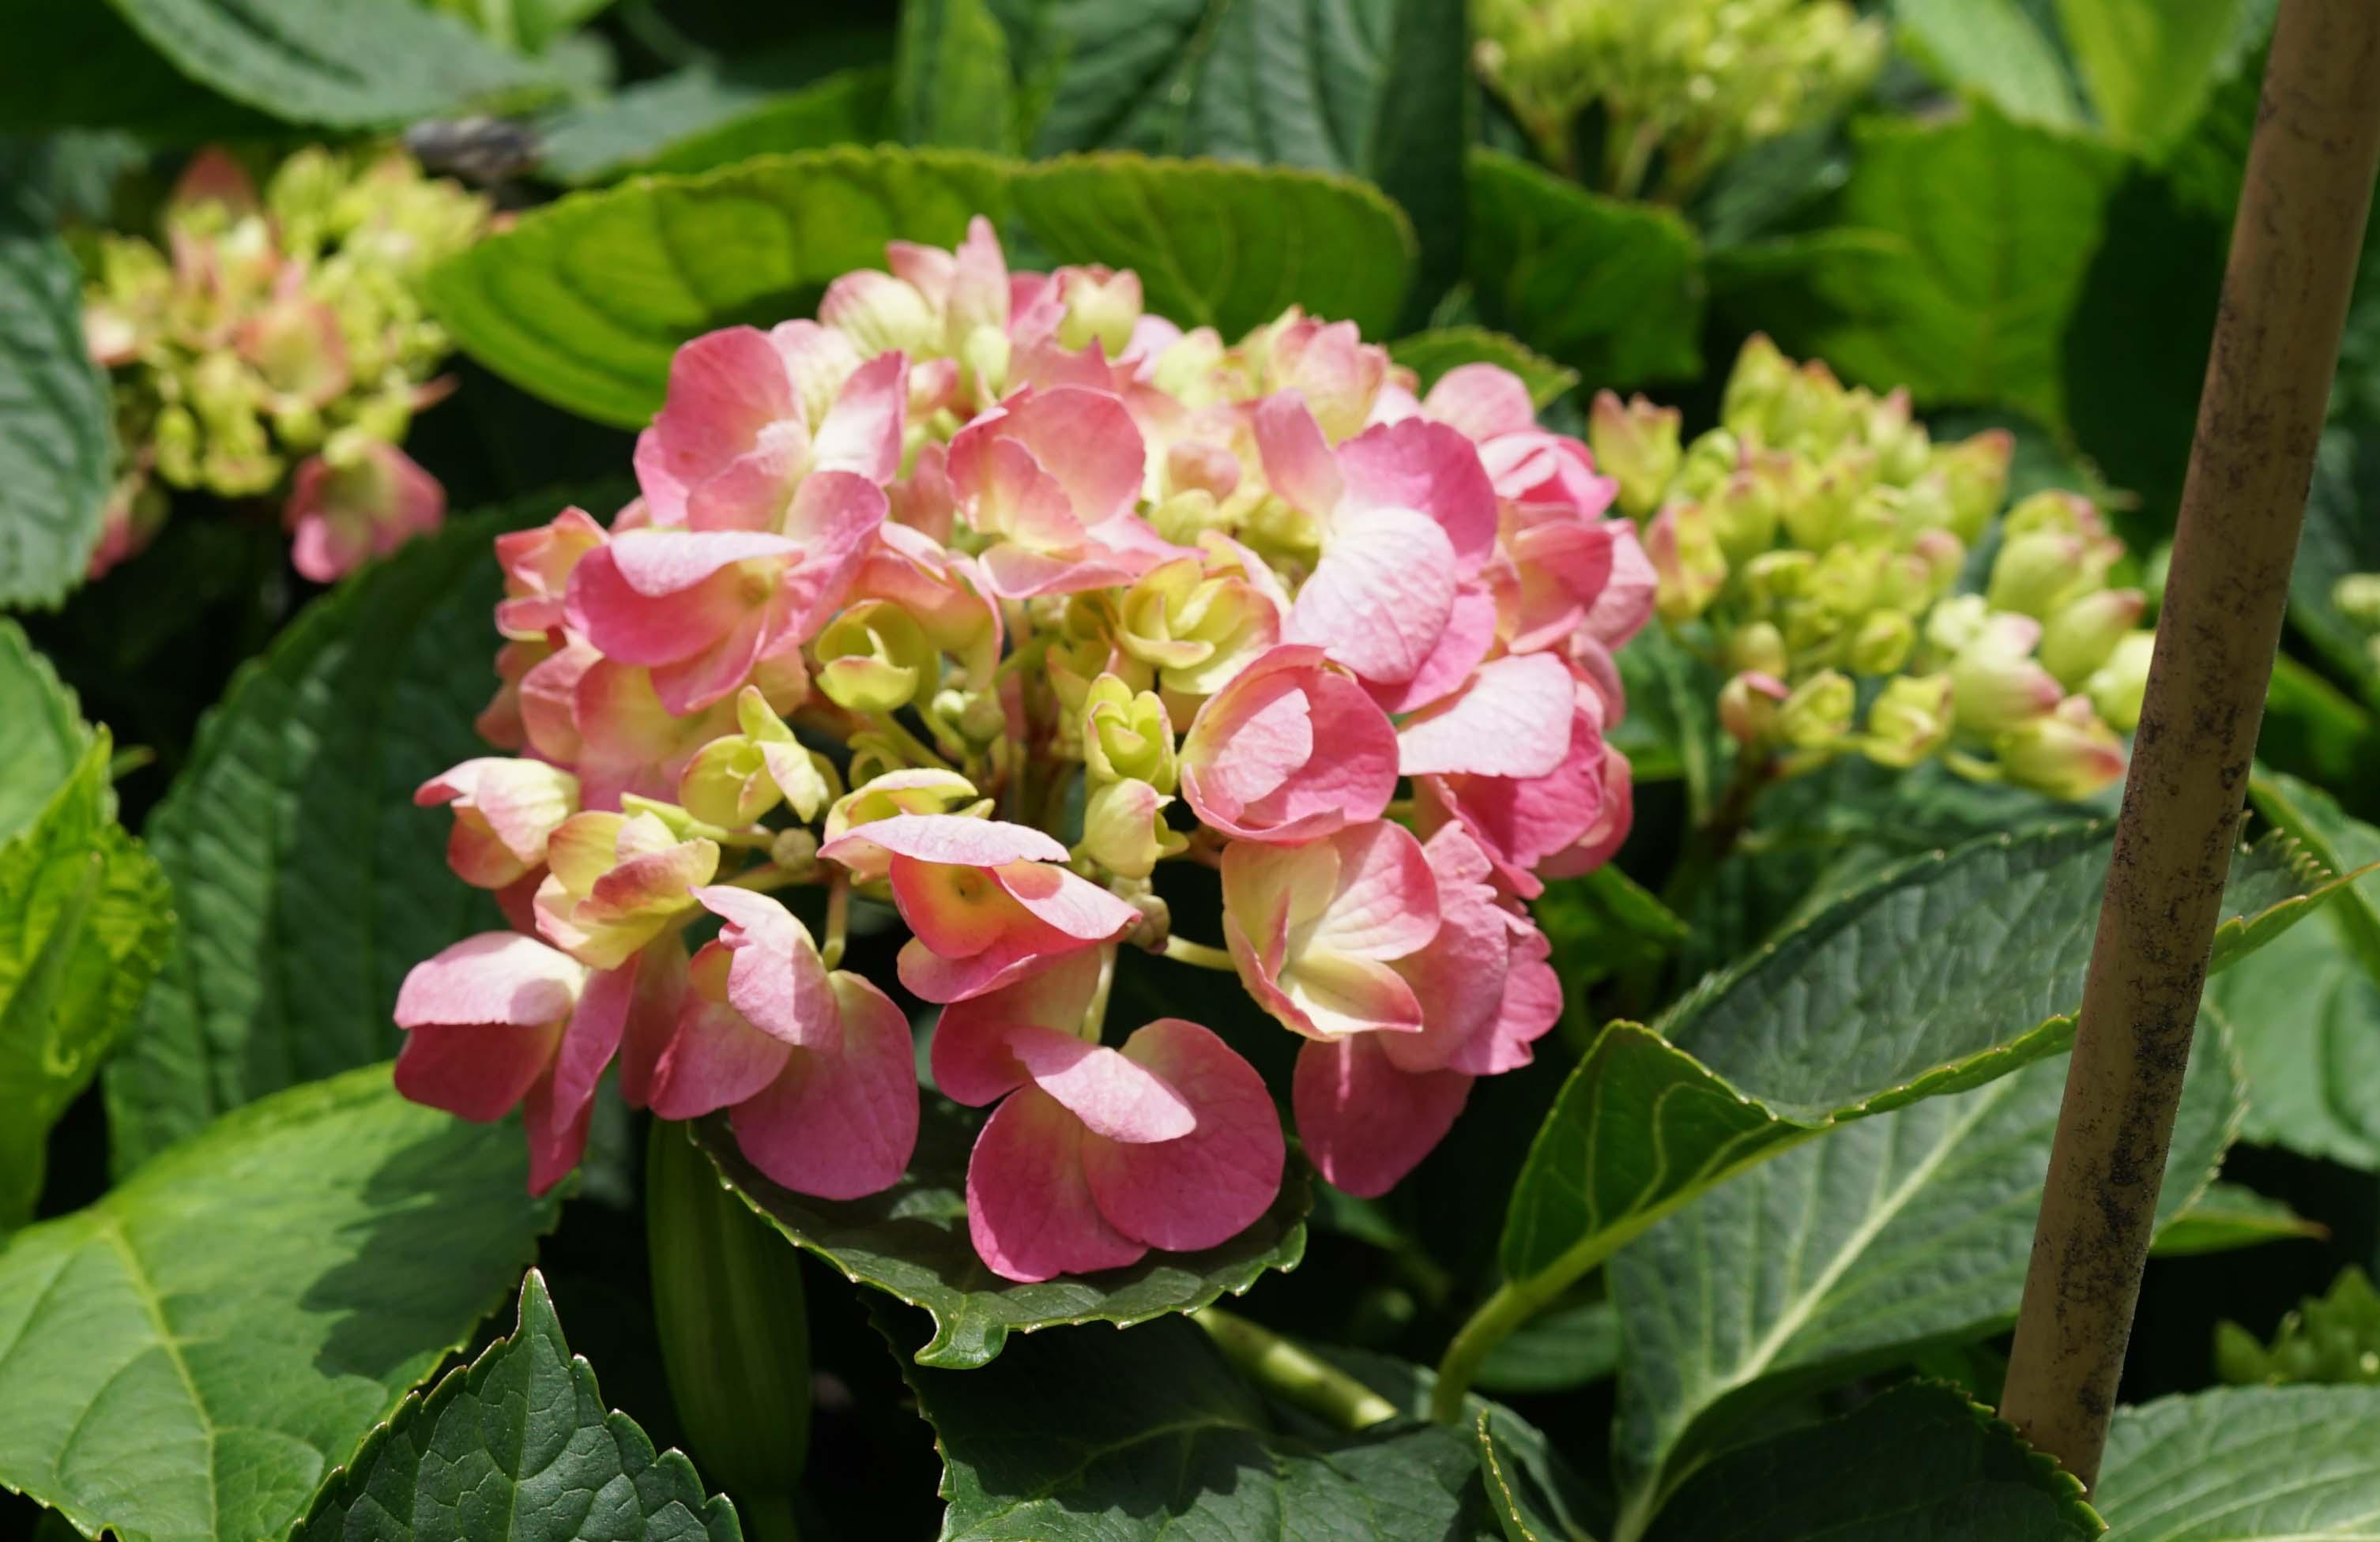 Garden small pink flowers